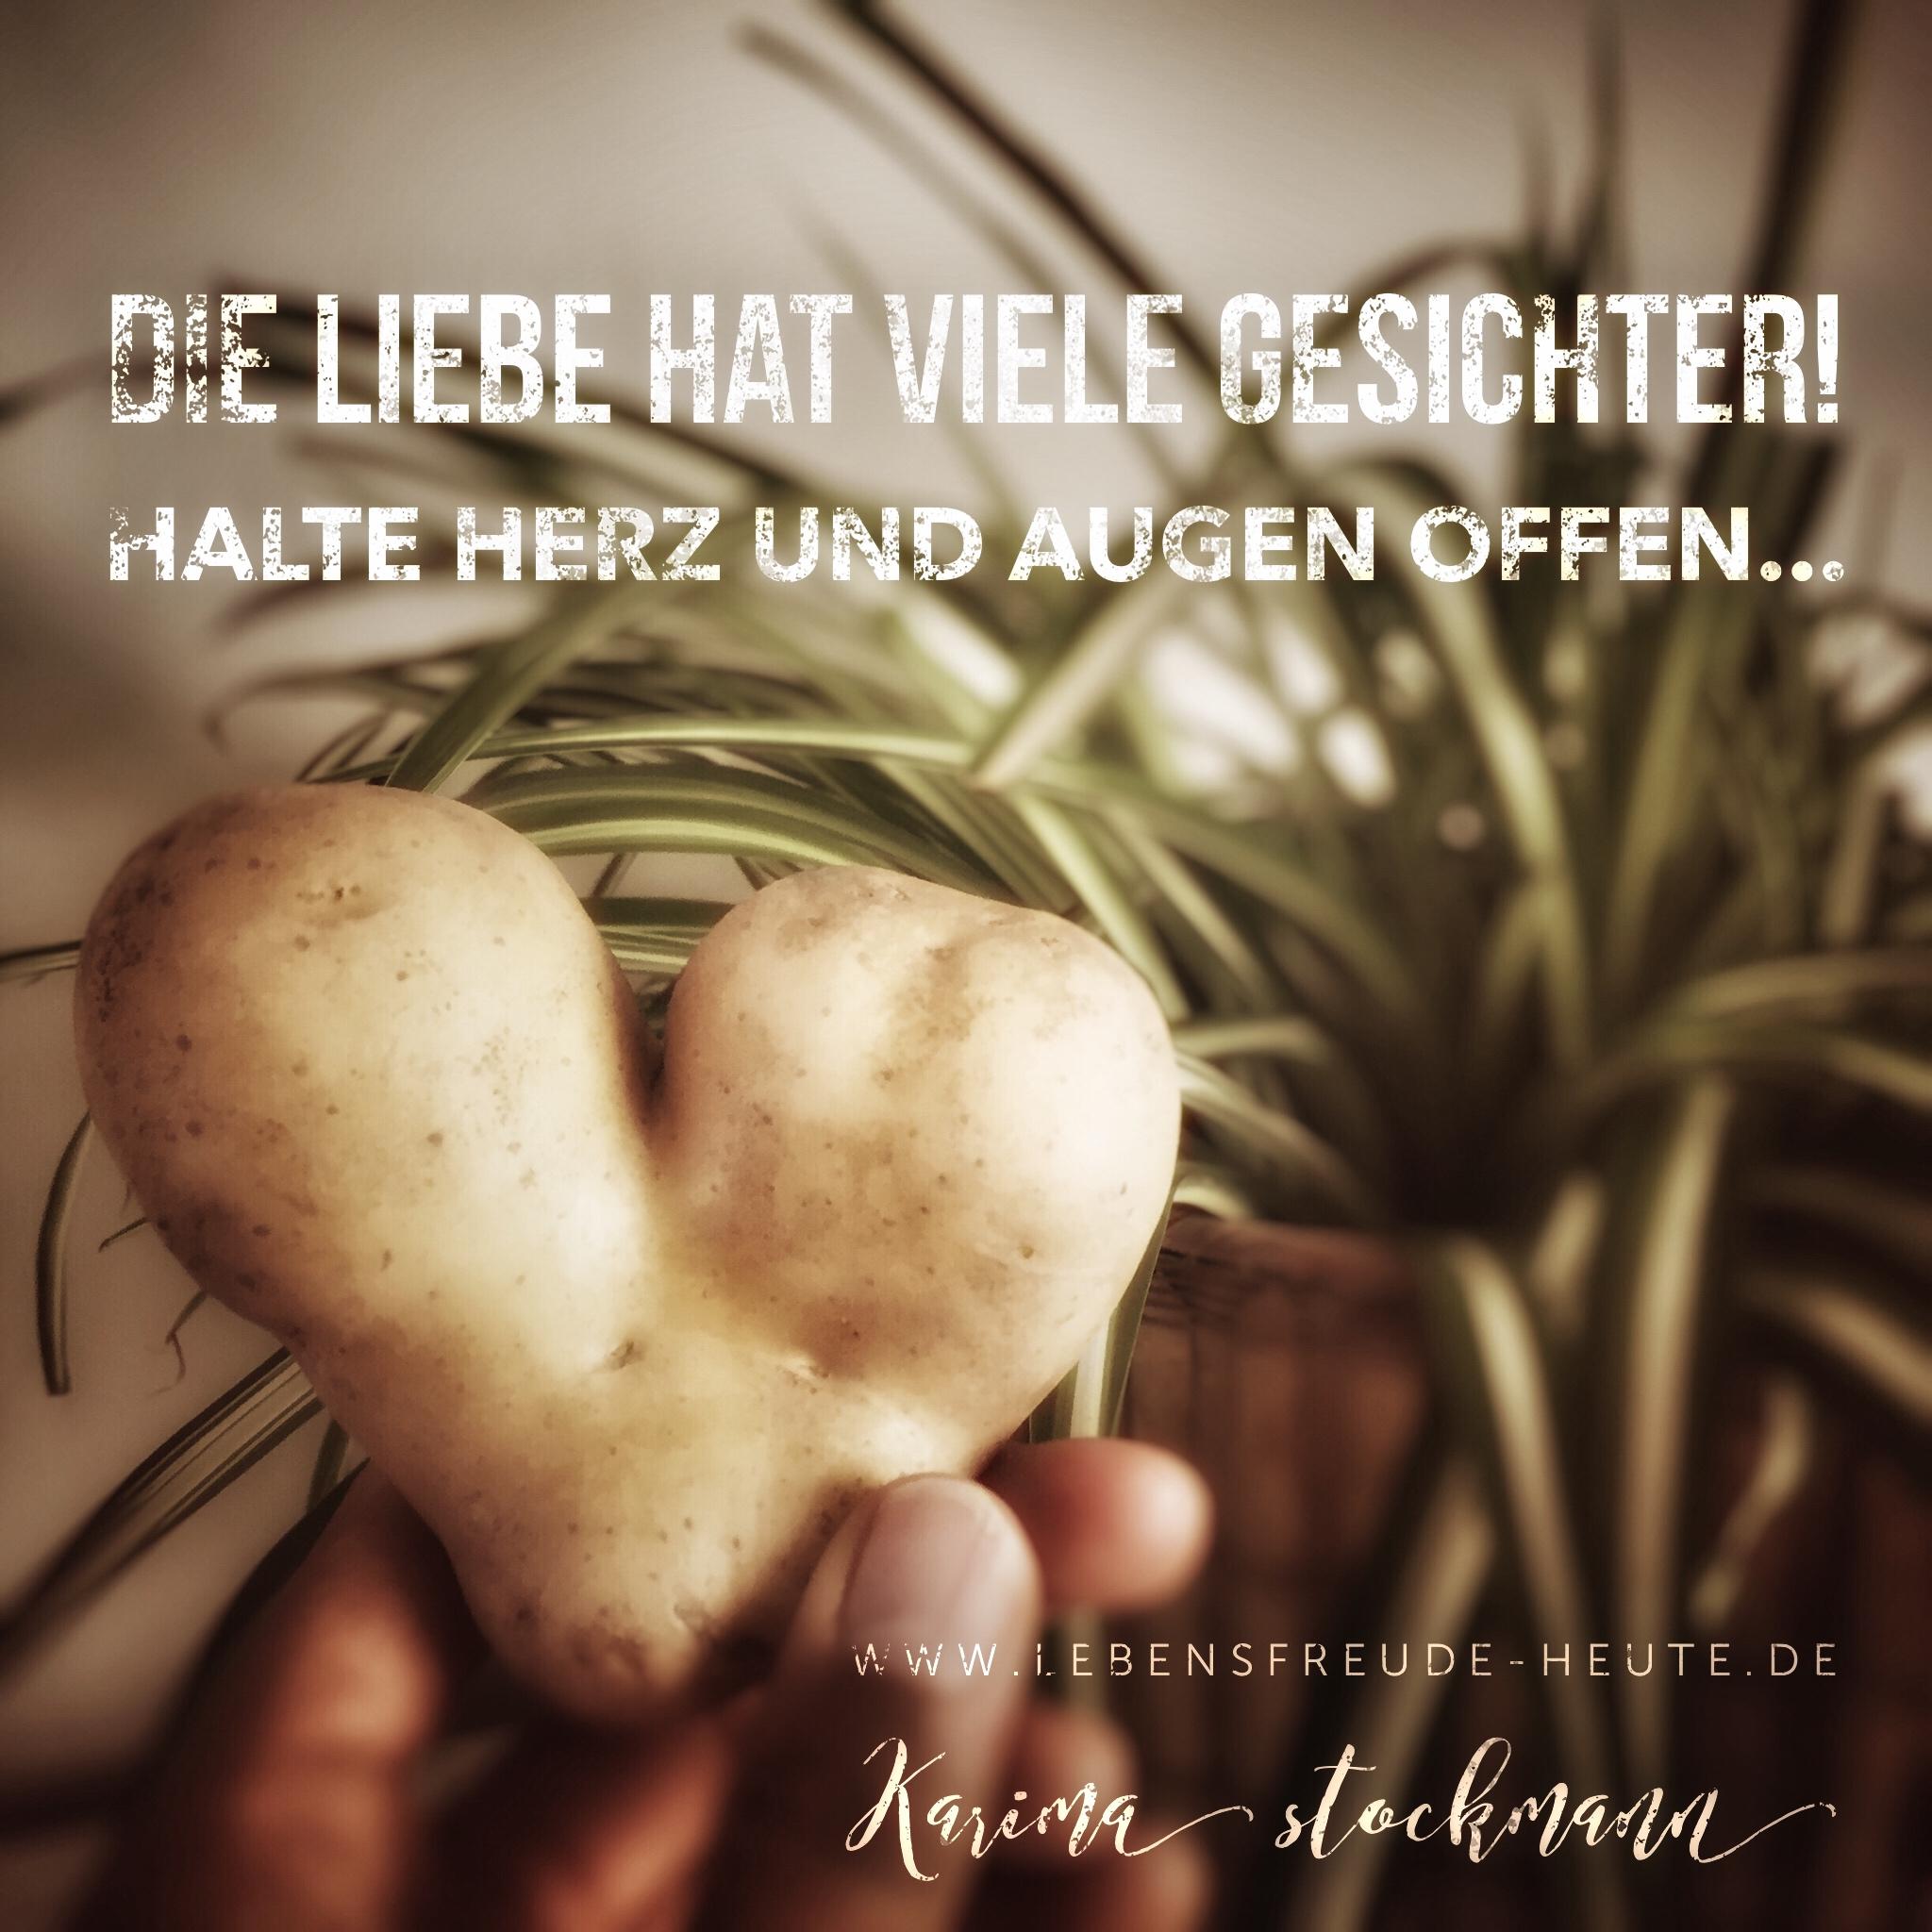 lebensfreude-heute_karima-stockmann_liebe-herz